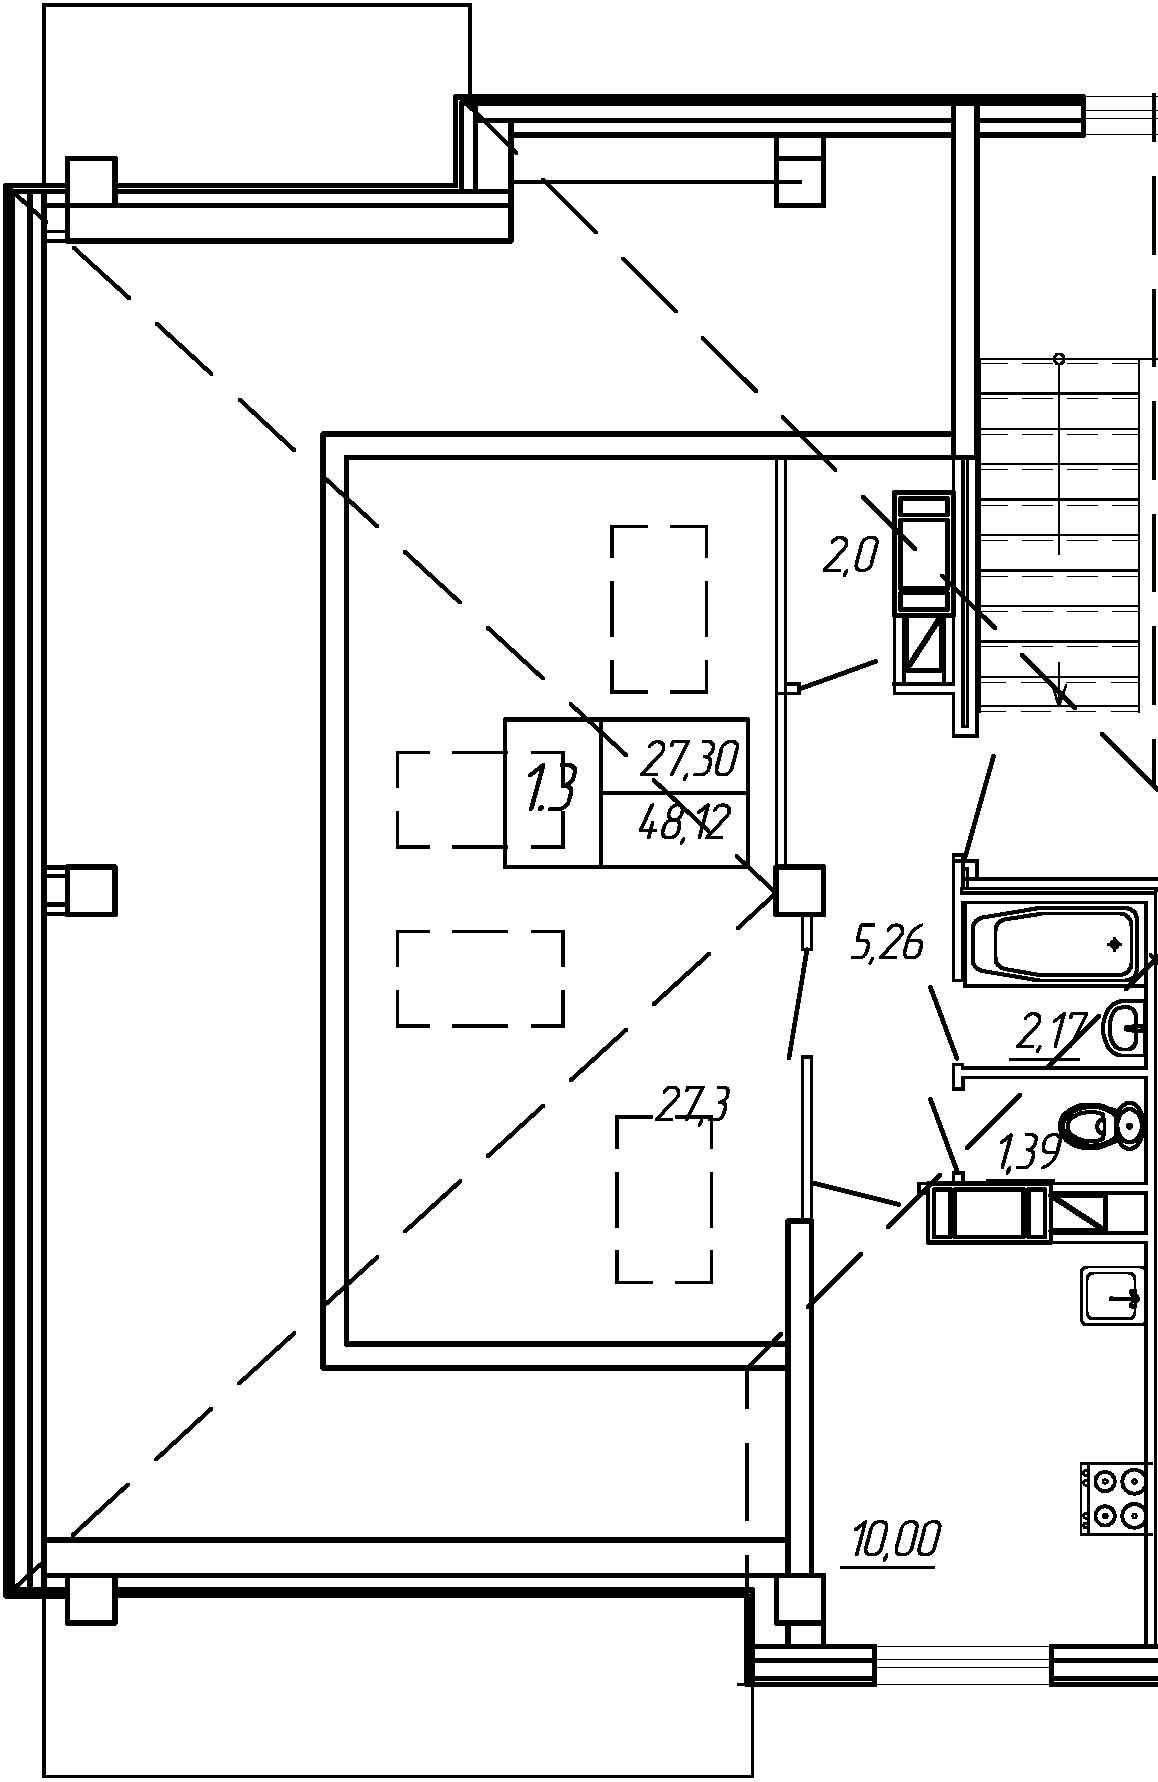 Жилойдом по ул.Мохова, 44(по ГП), Однокомнатная квартира площадью 48.12 м2